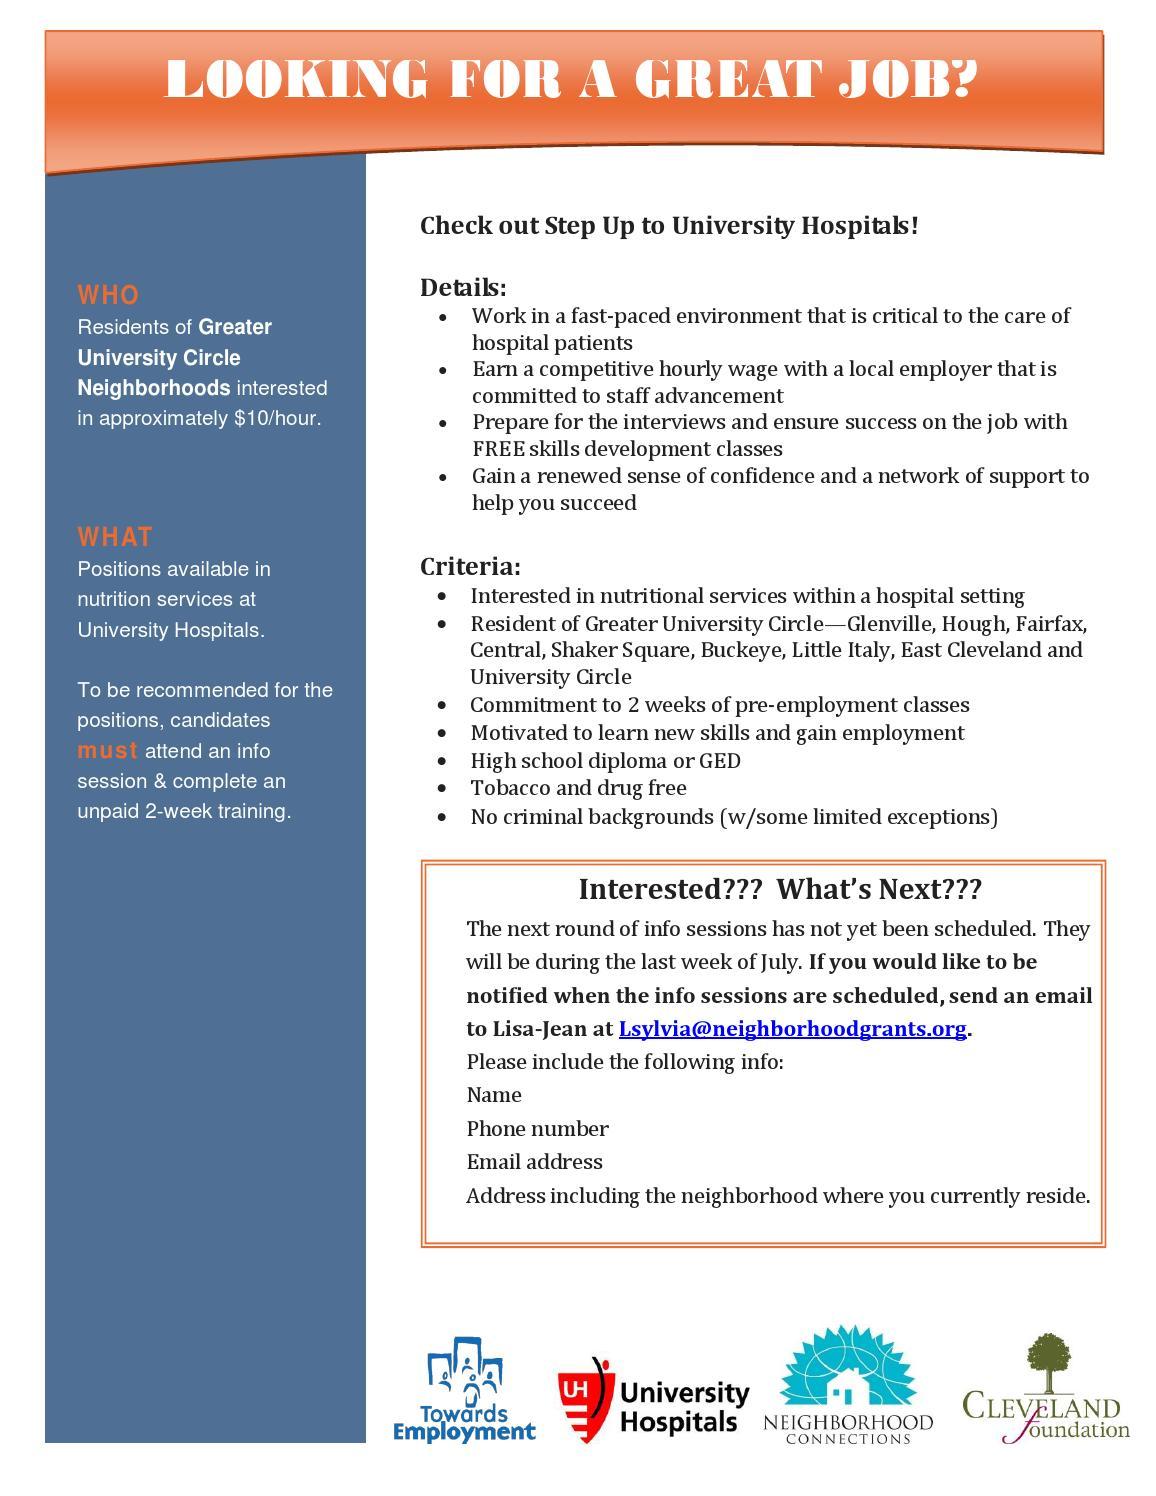 Step Up to University Hospitals Program